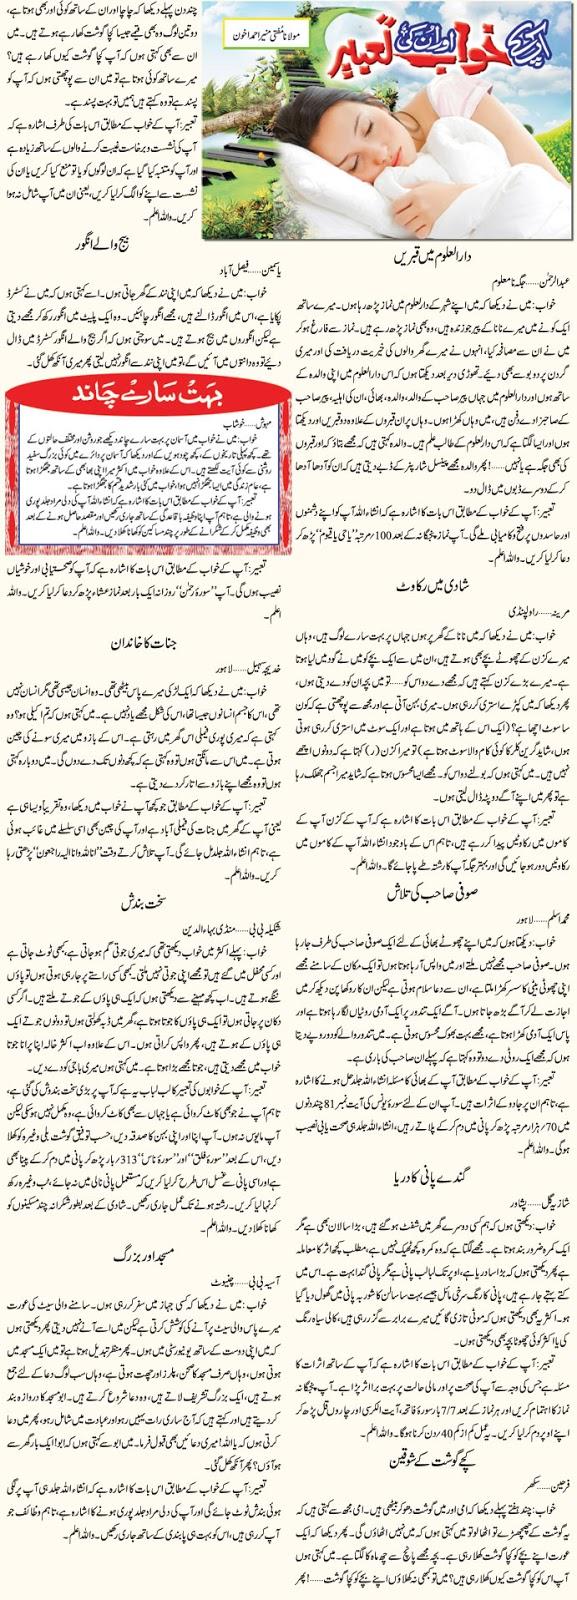 Khawabon ki tabeer, Islamic interpretation, Explanation, Analysis, Meanings of dreams